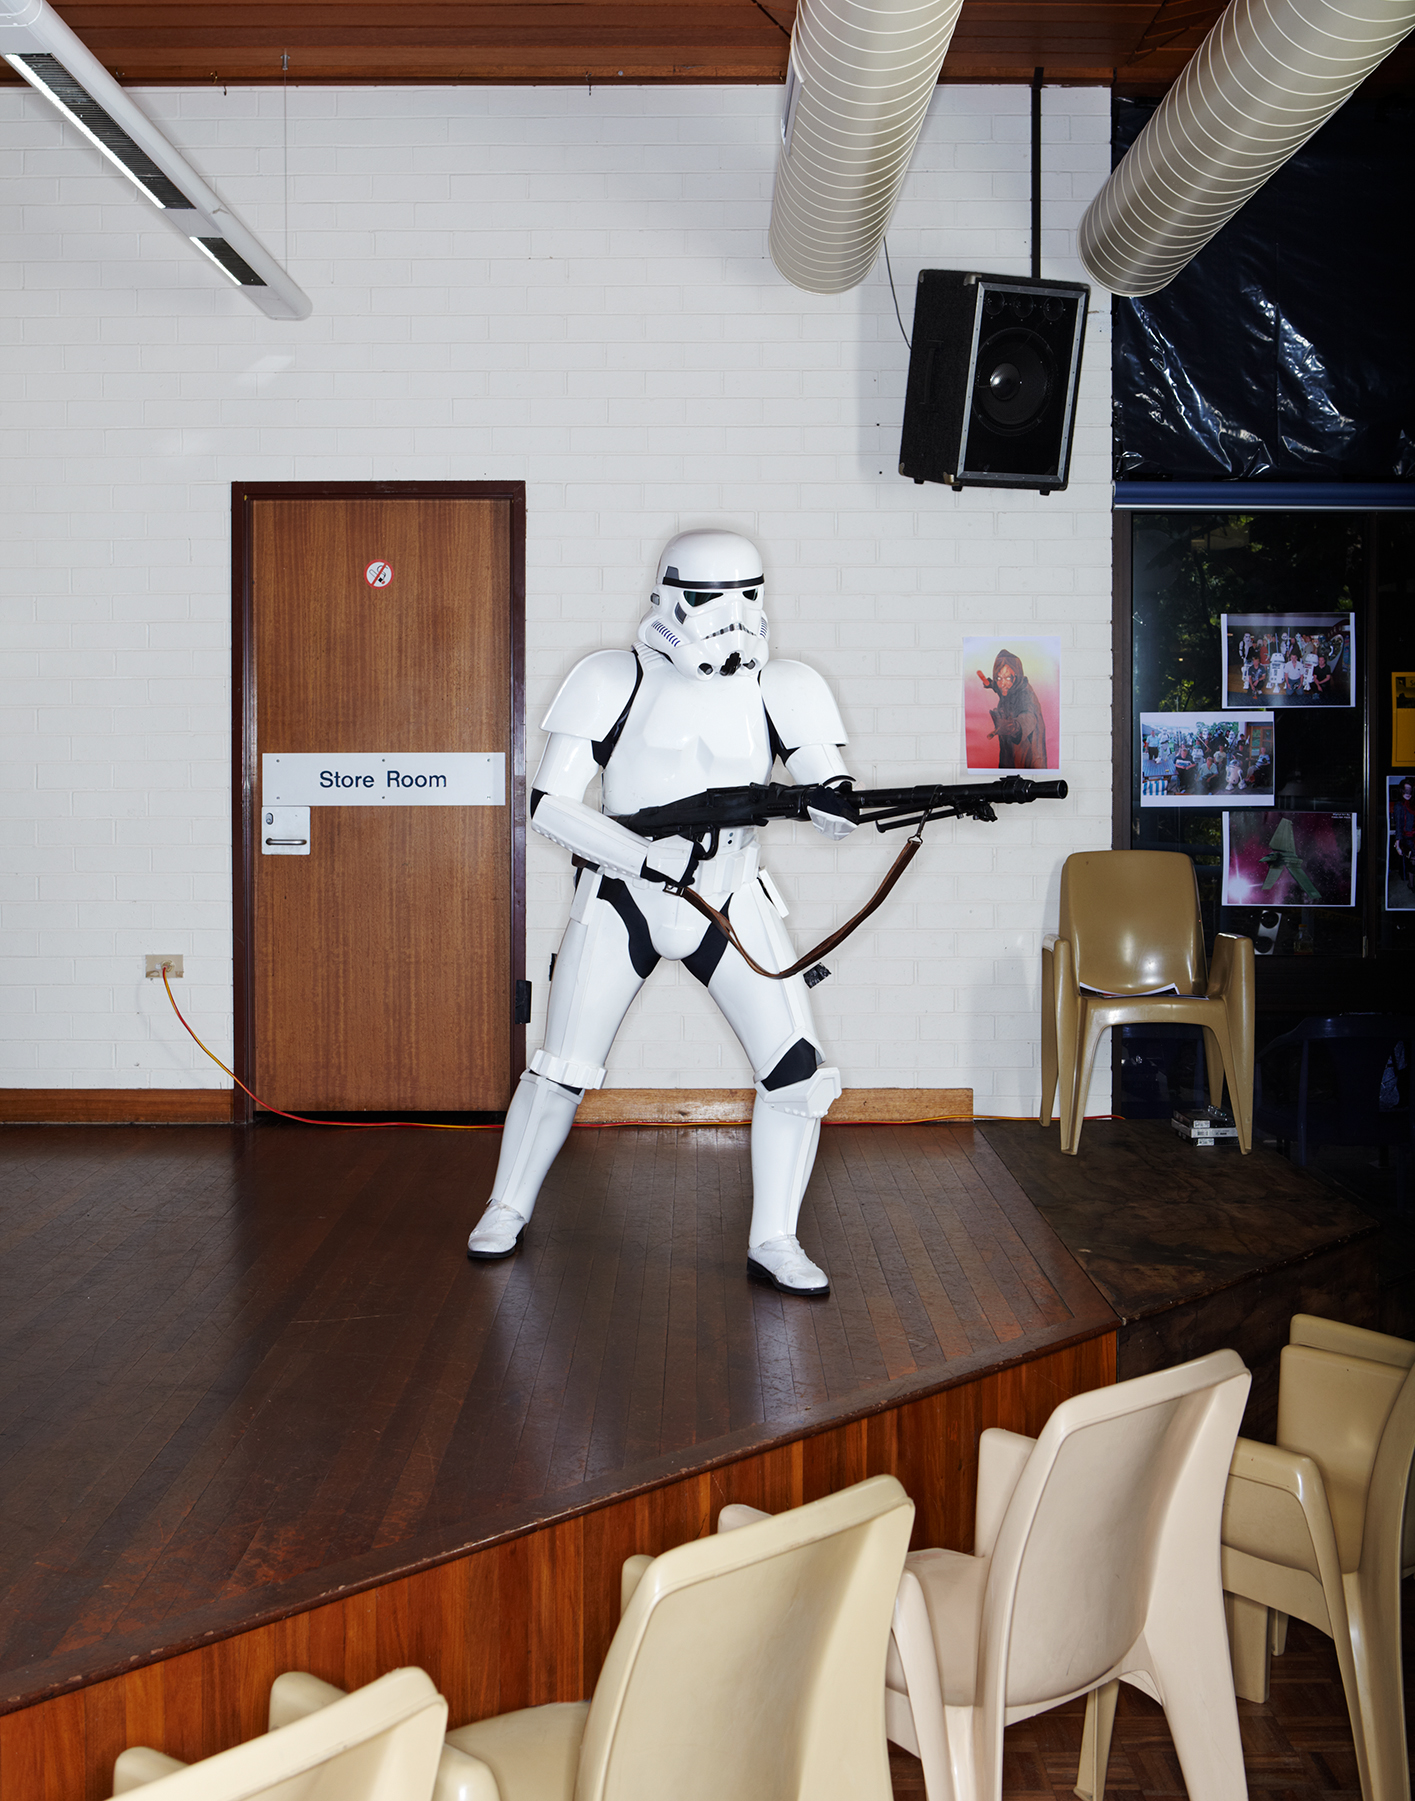 Dave - Stormtrooper / 501st Legion